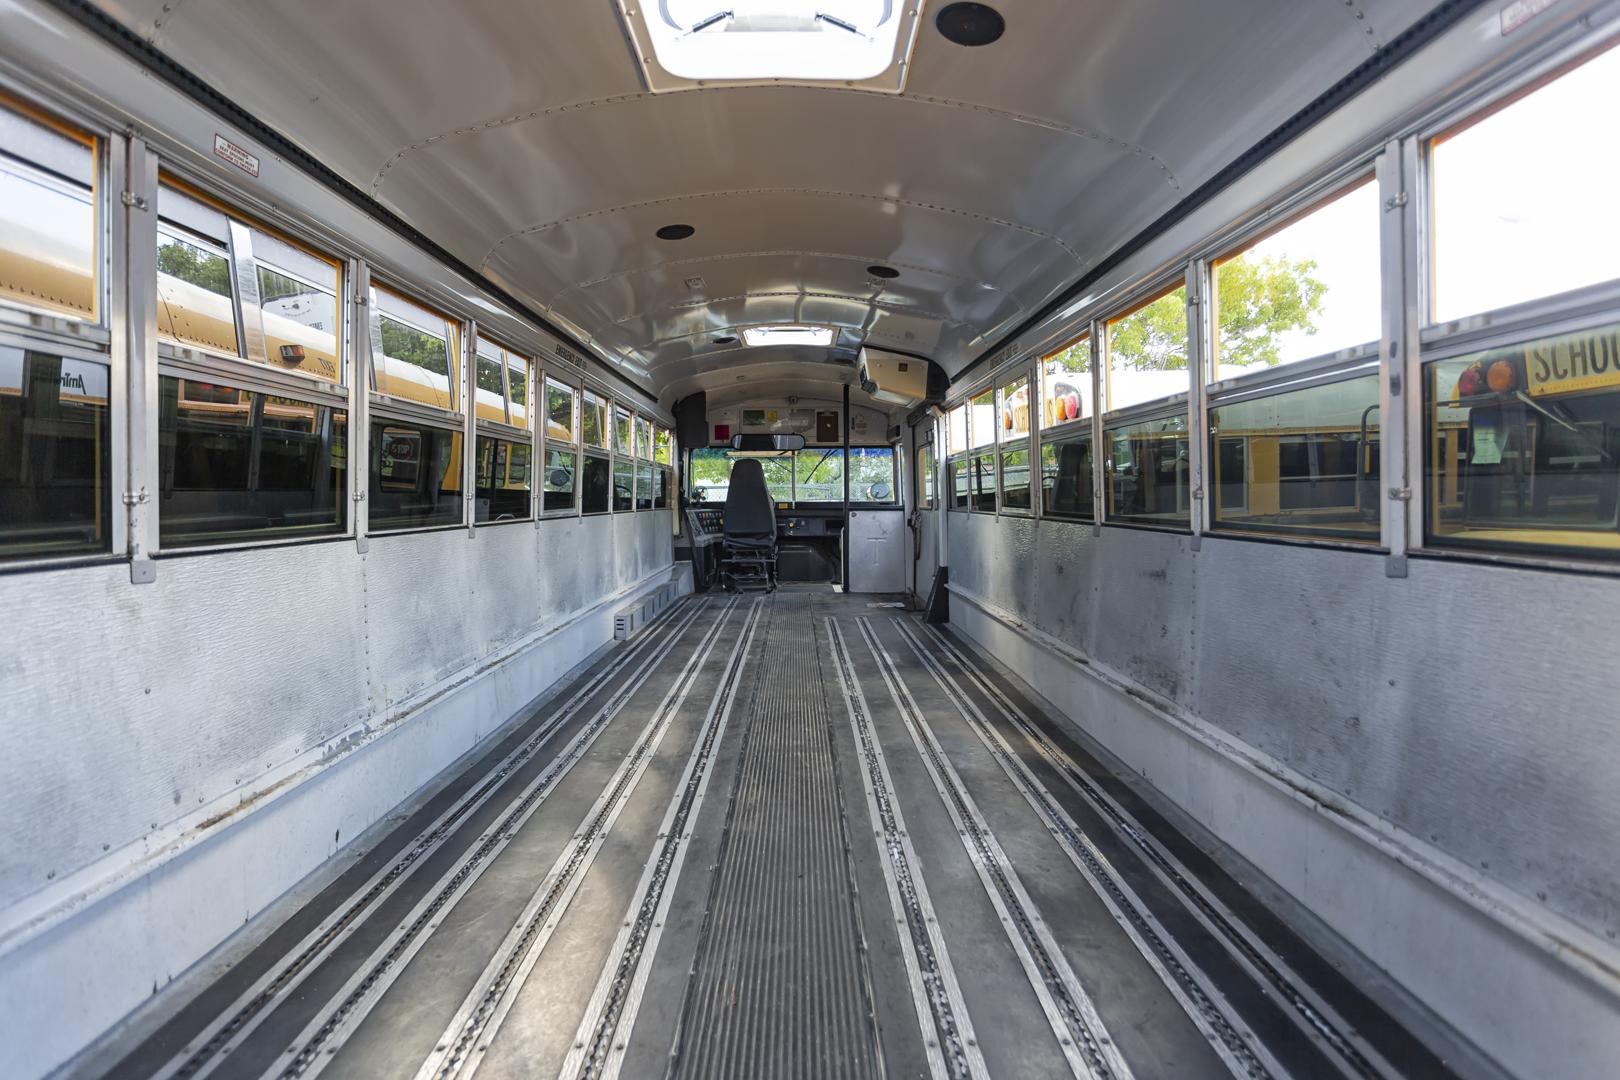 School bus tracking on floor